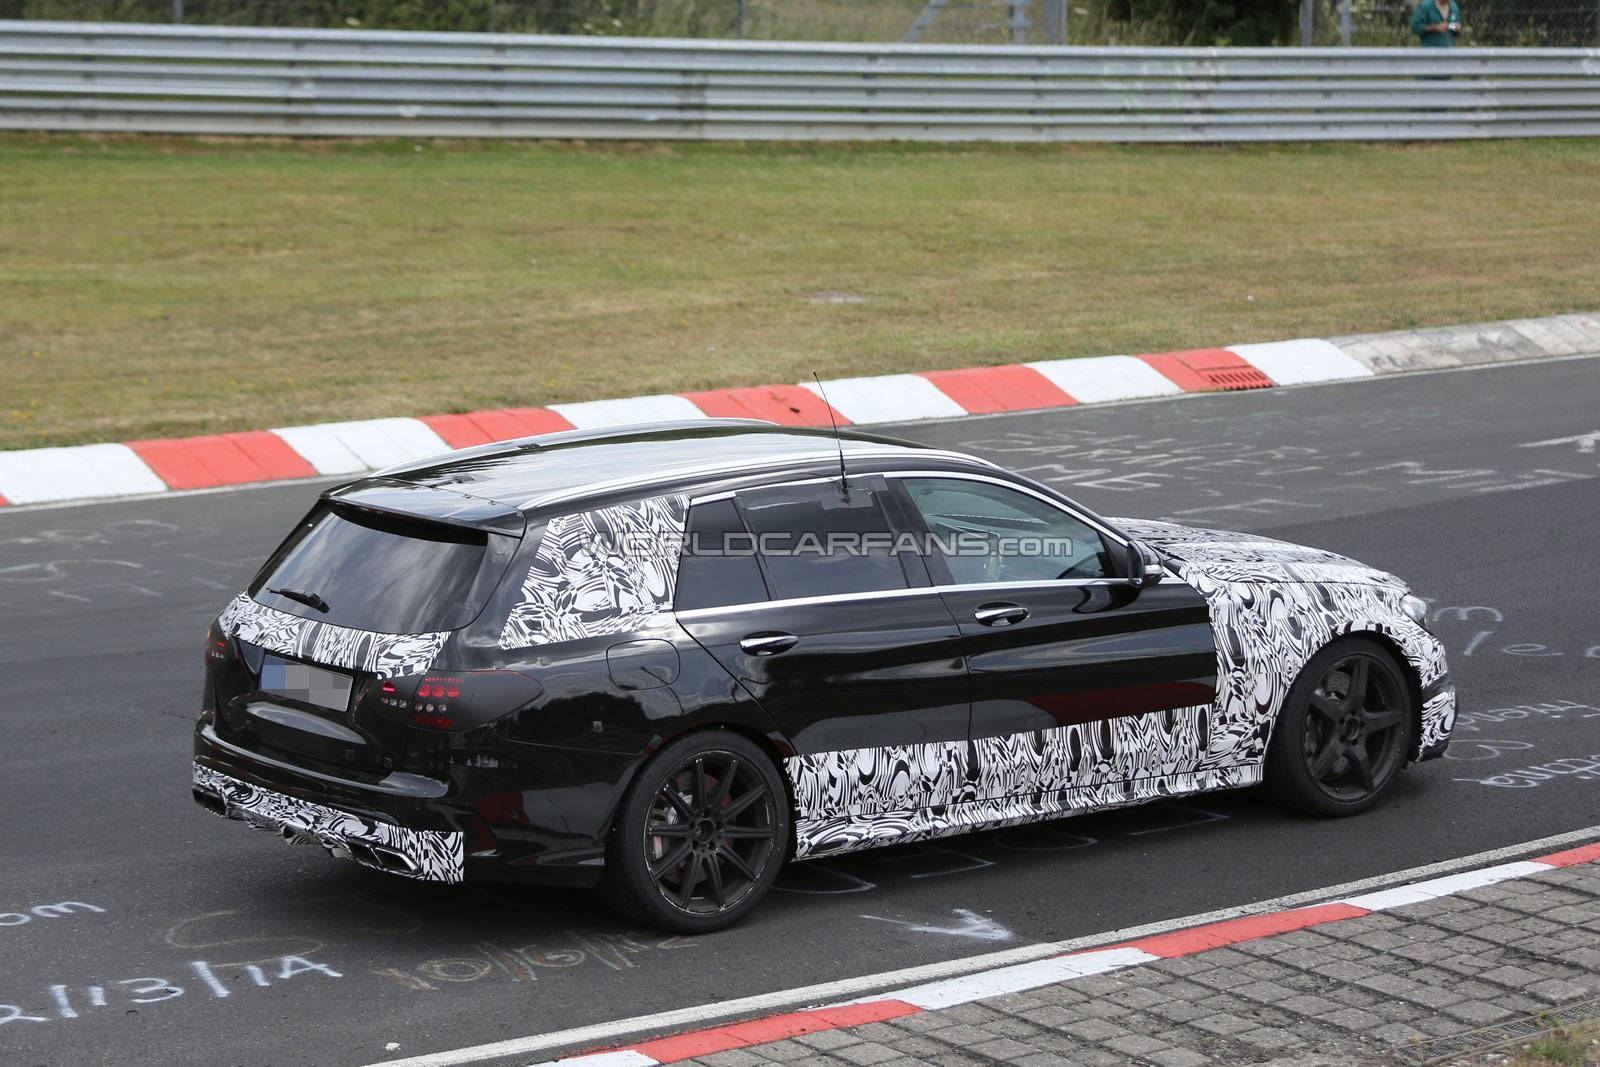 (S205): Protótipos da C63 flagrados em testes em Nürburgring C63-amg-estate-6-30-7